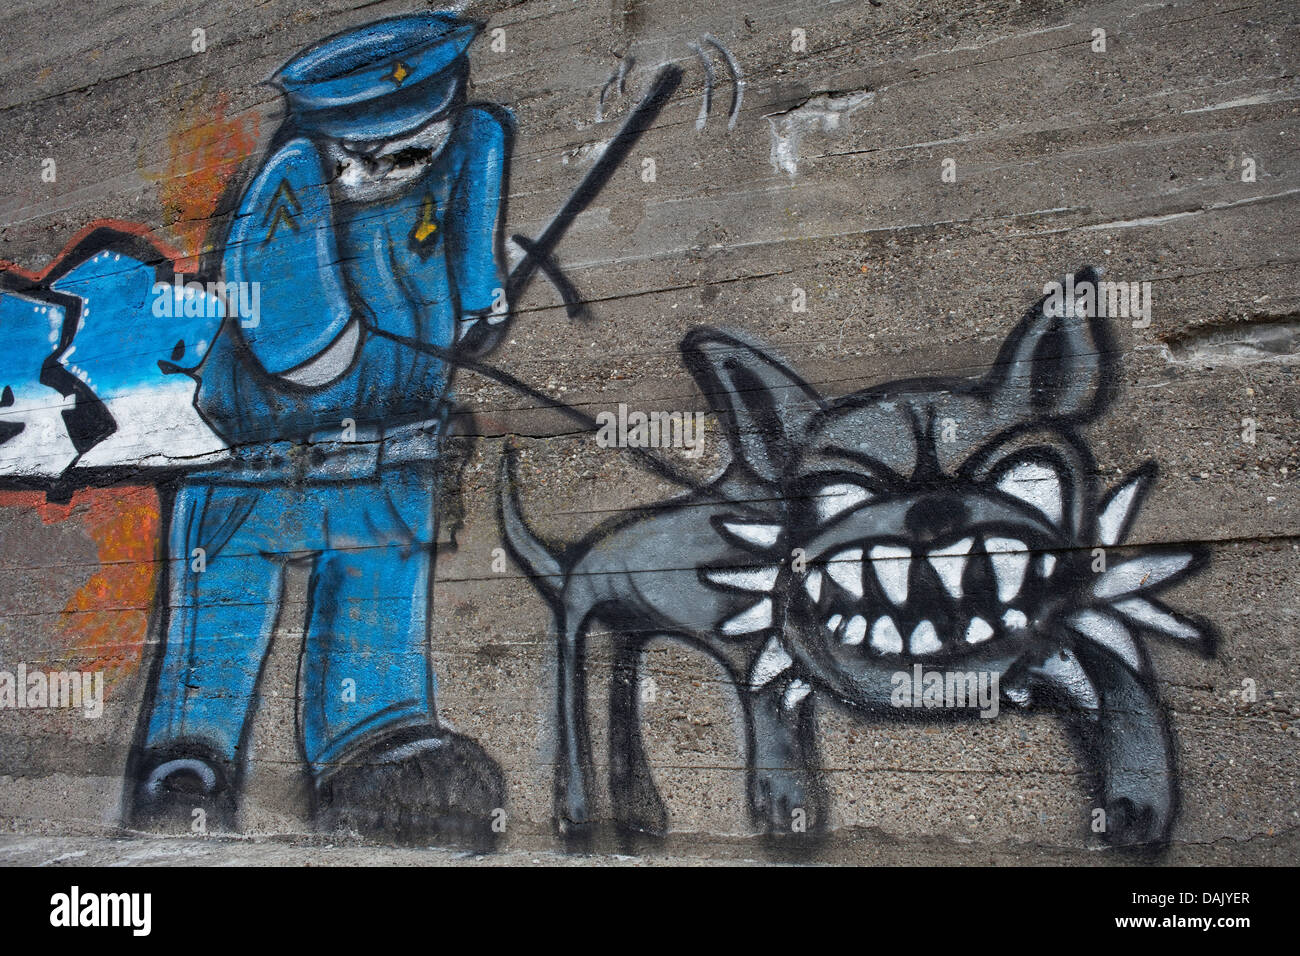 Policeman with a tough dog, graffiti - Stock Image